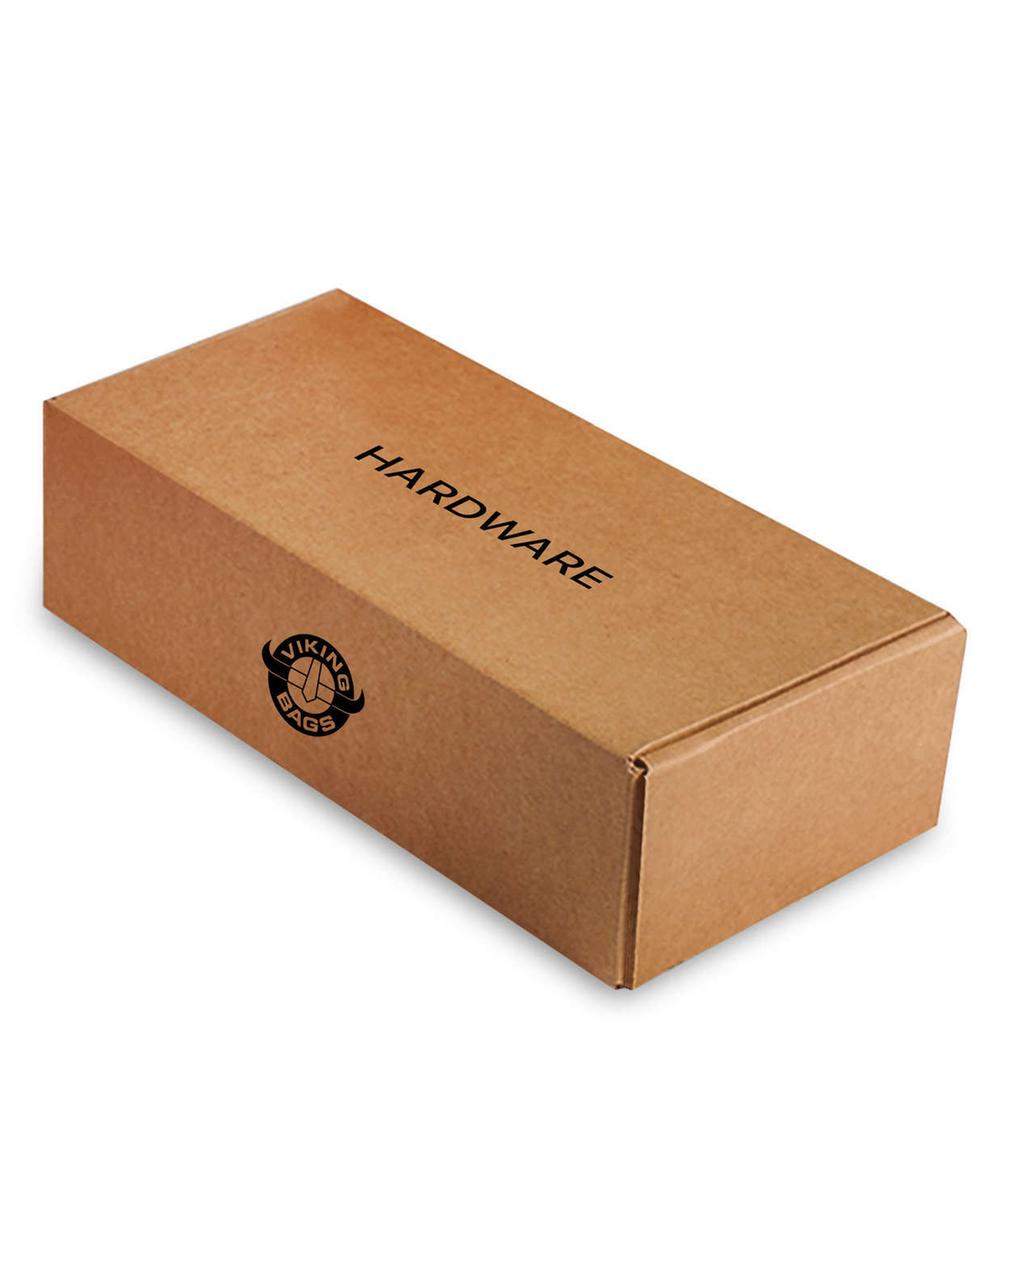 Honda 1500 Valkyrie Interstate SS Side Pocket Studded Motorcycle Saddlebags Hardware Box